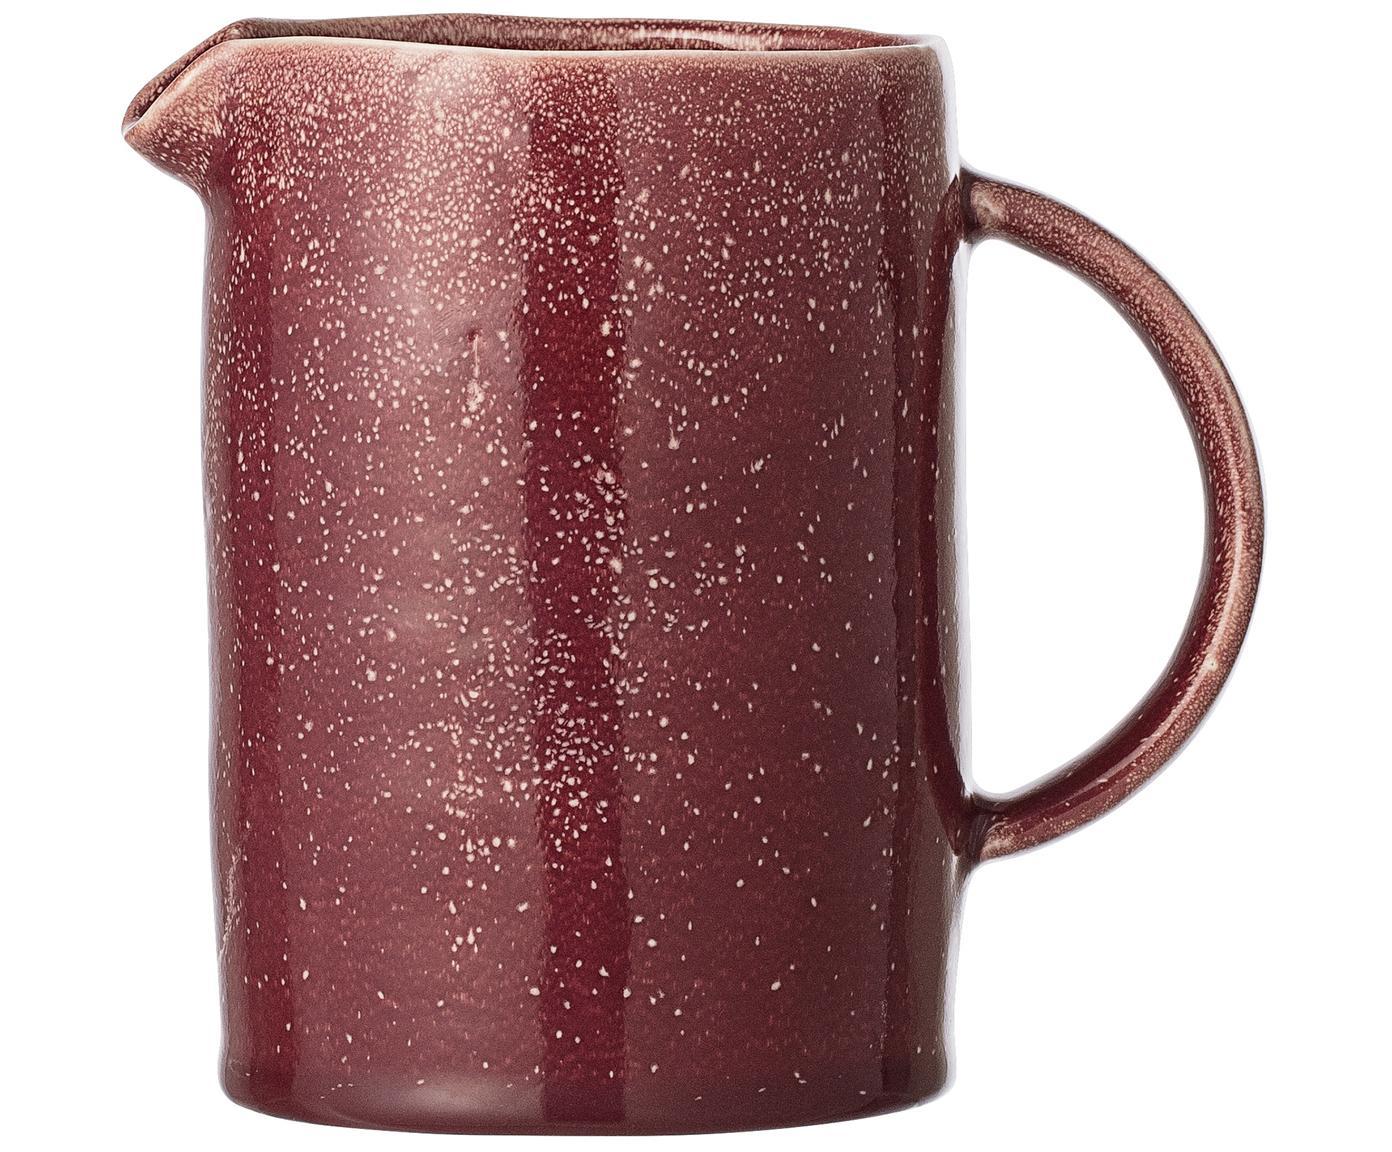 Handgemaaakte karaf Joelle, Gelakt keramiek, Wijnrood, crèmekleurig, 800 ml